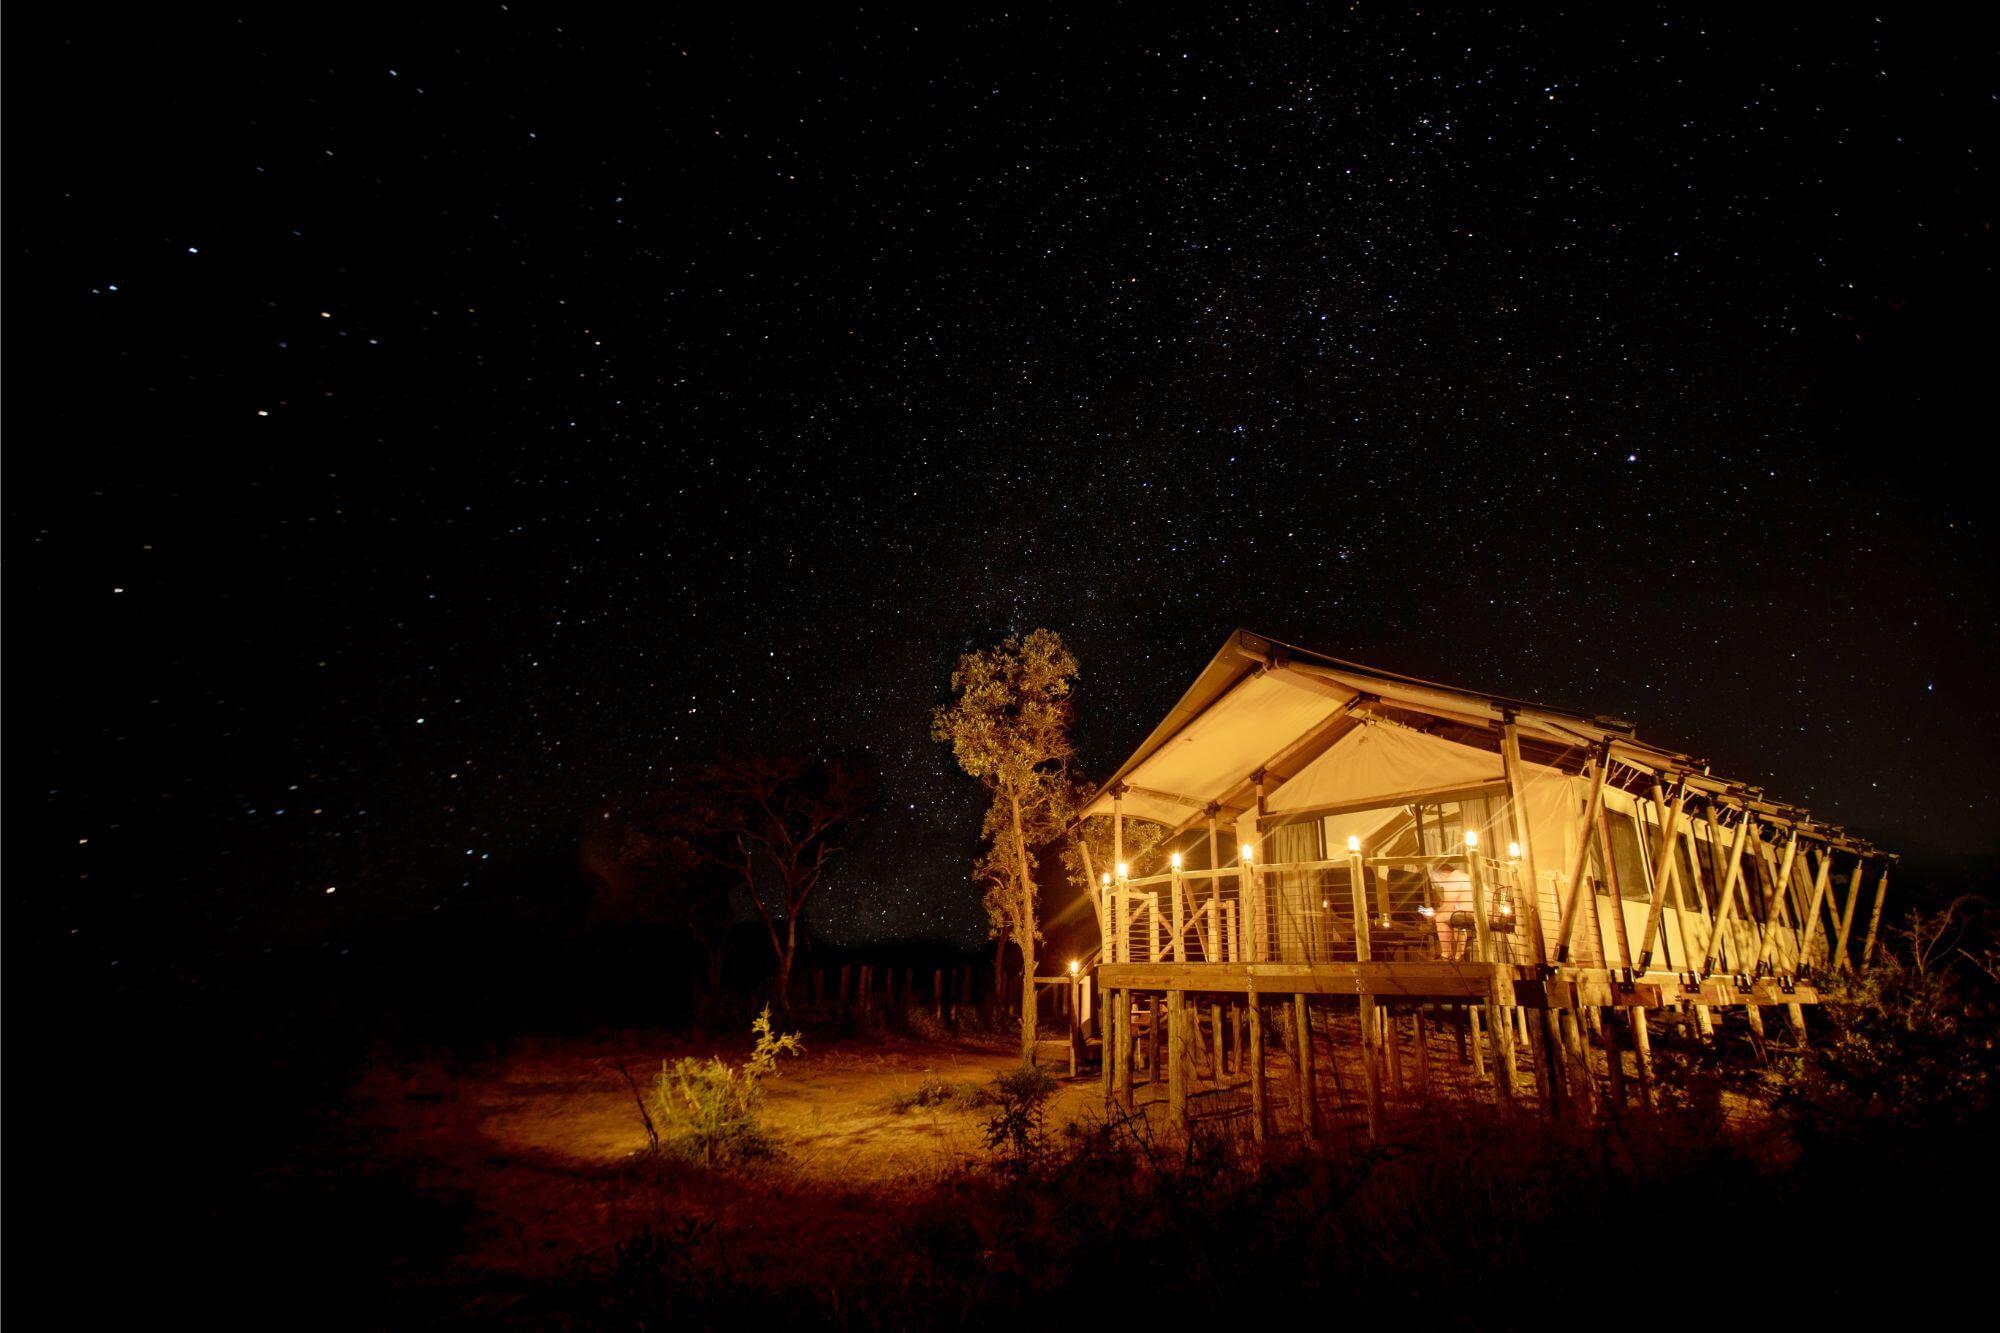 Mdluli 5 - Mdluli Safari Lodge